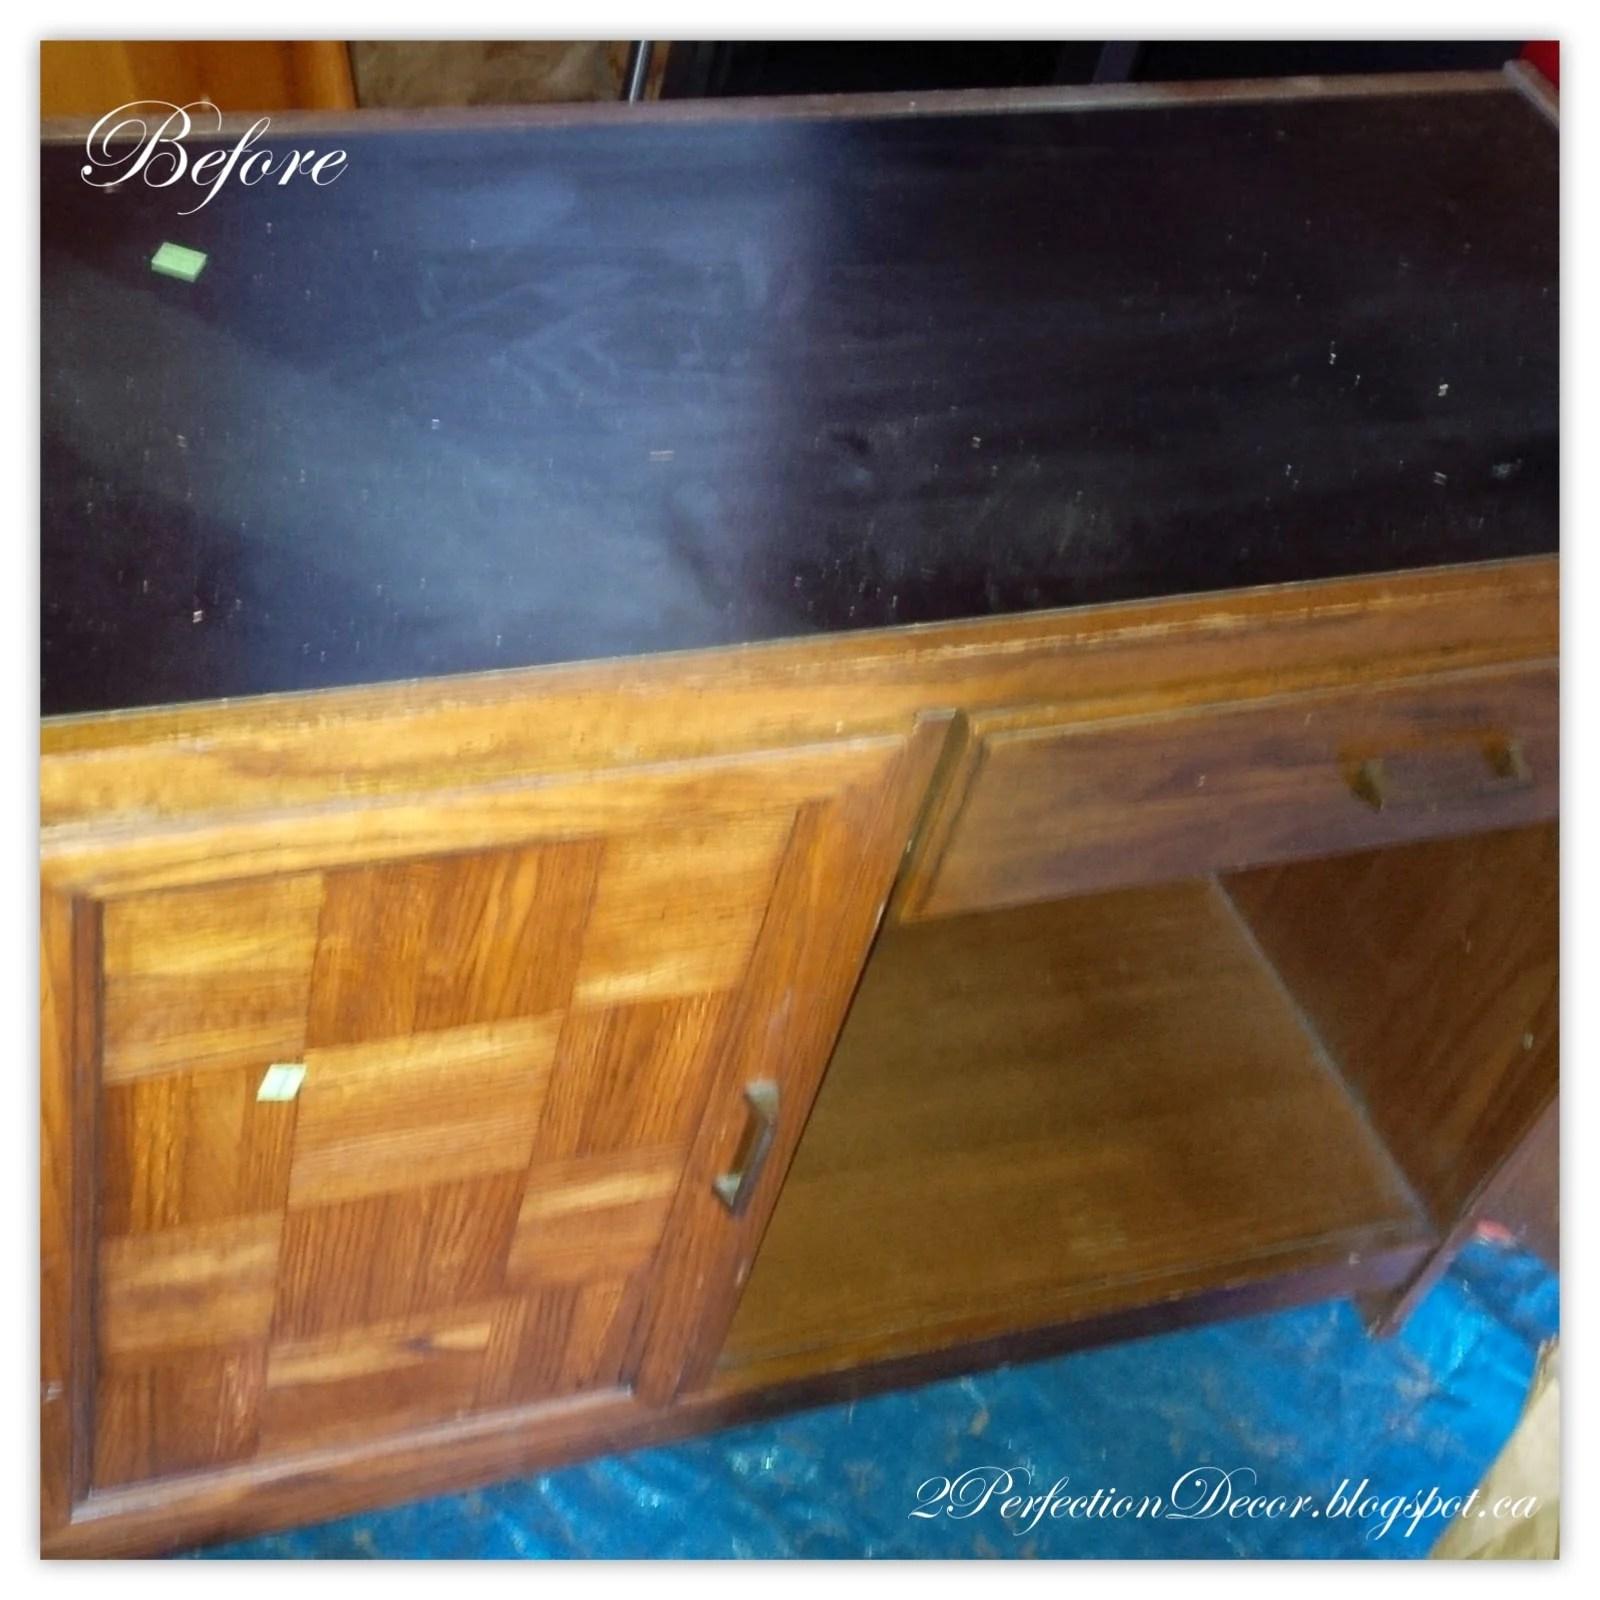 Upcycled Vintage Desk Into Kitchen Island